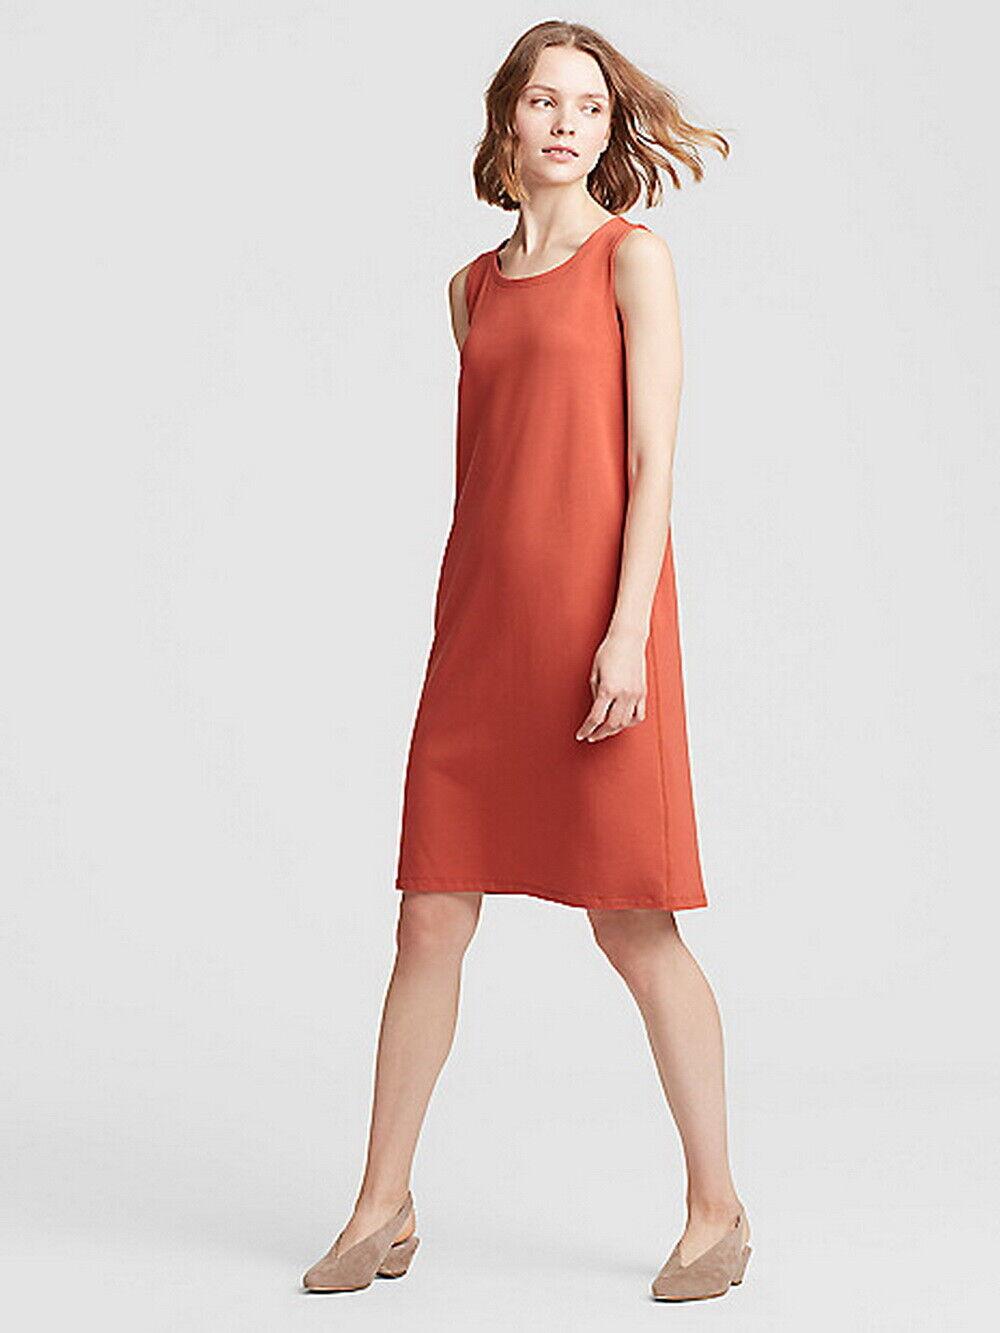 Eileen Fisher Orange Pekoe Organic Cotton Stretch Jersey Dress Large Orig